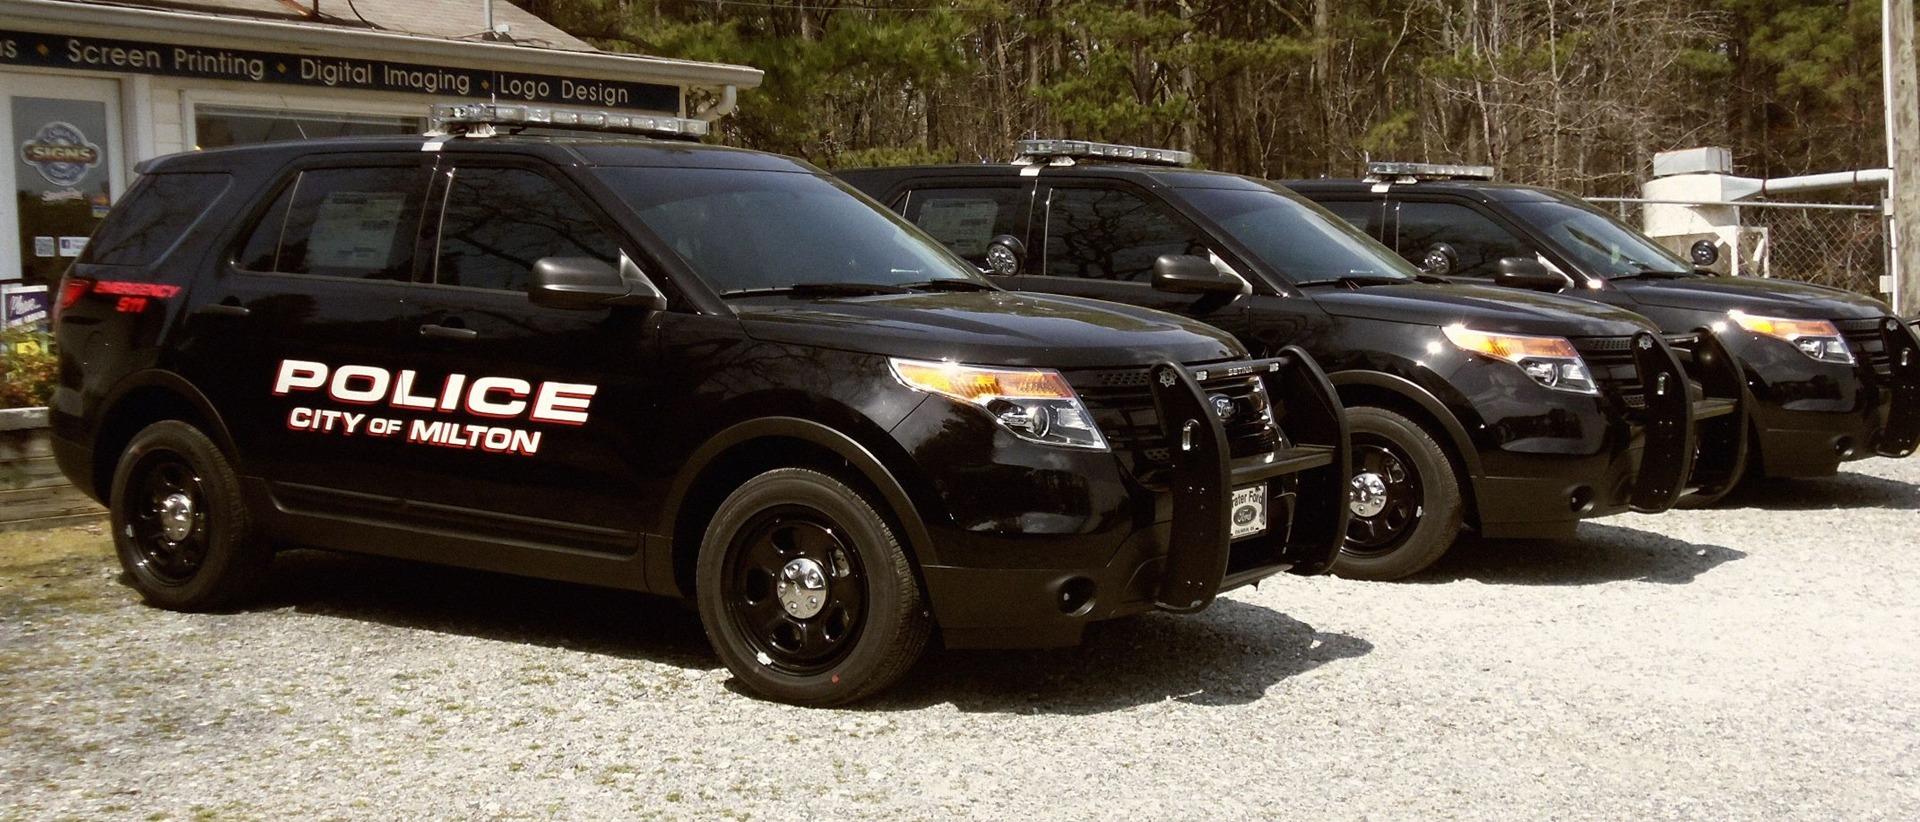 milton police - fleet.jpg